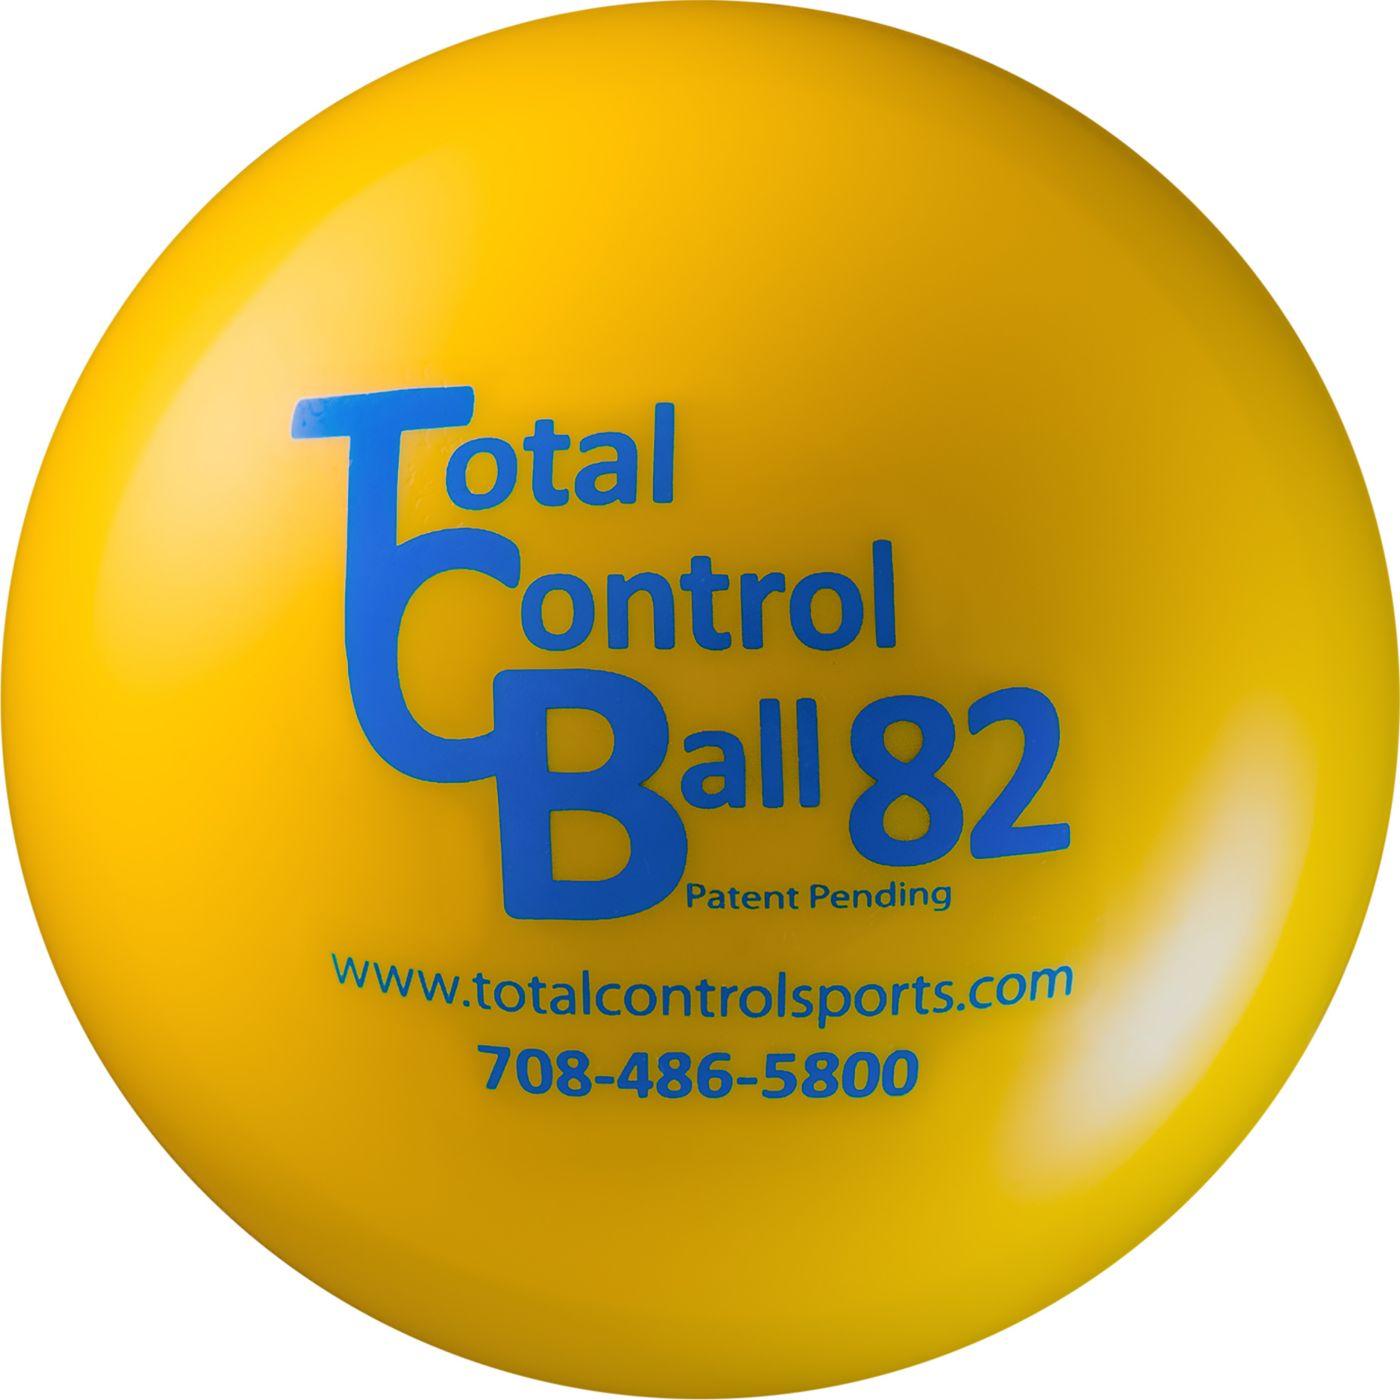 Total Control Sports TCB 82 Balls - 6 Pack